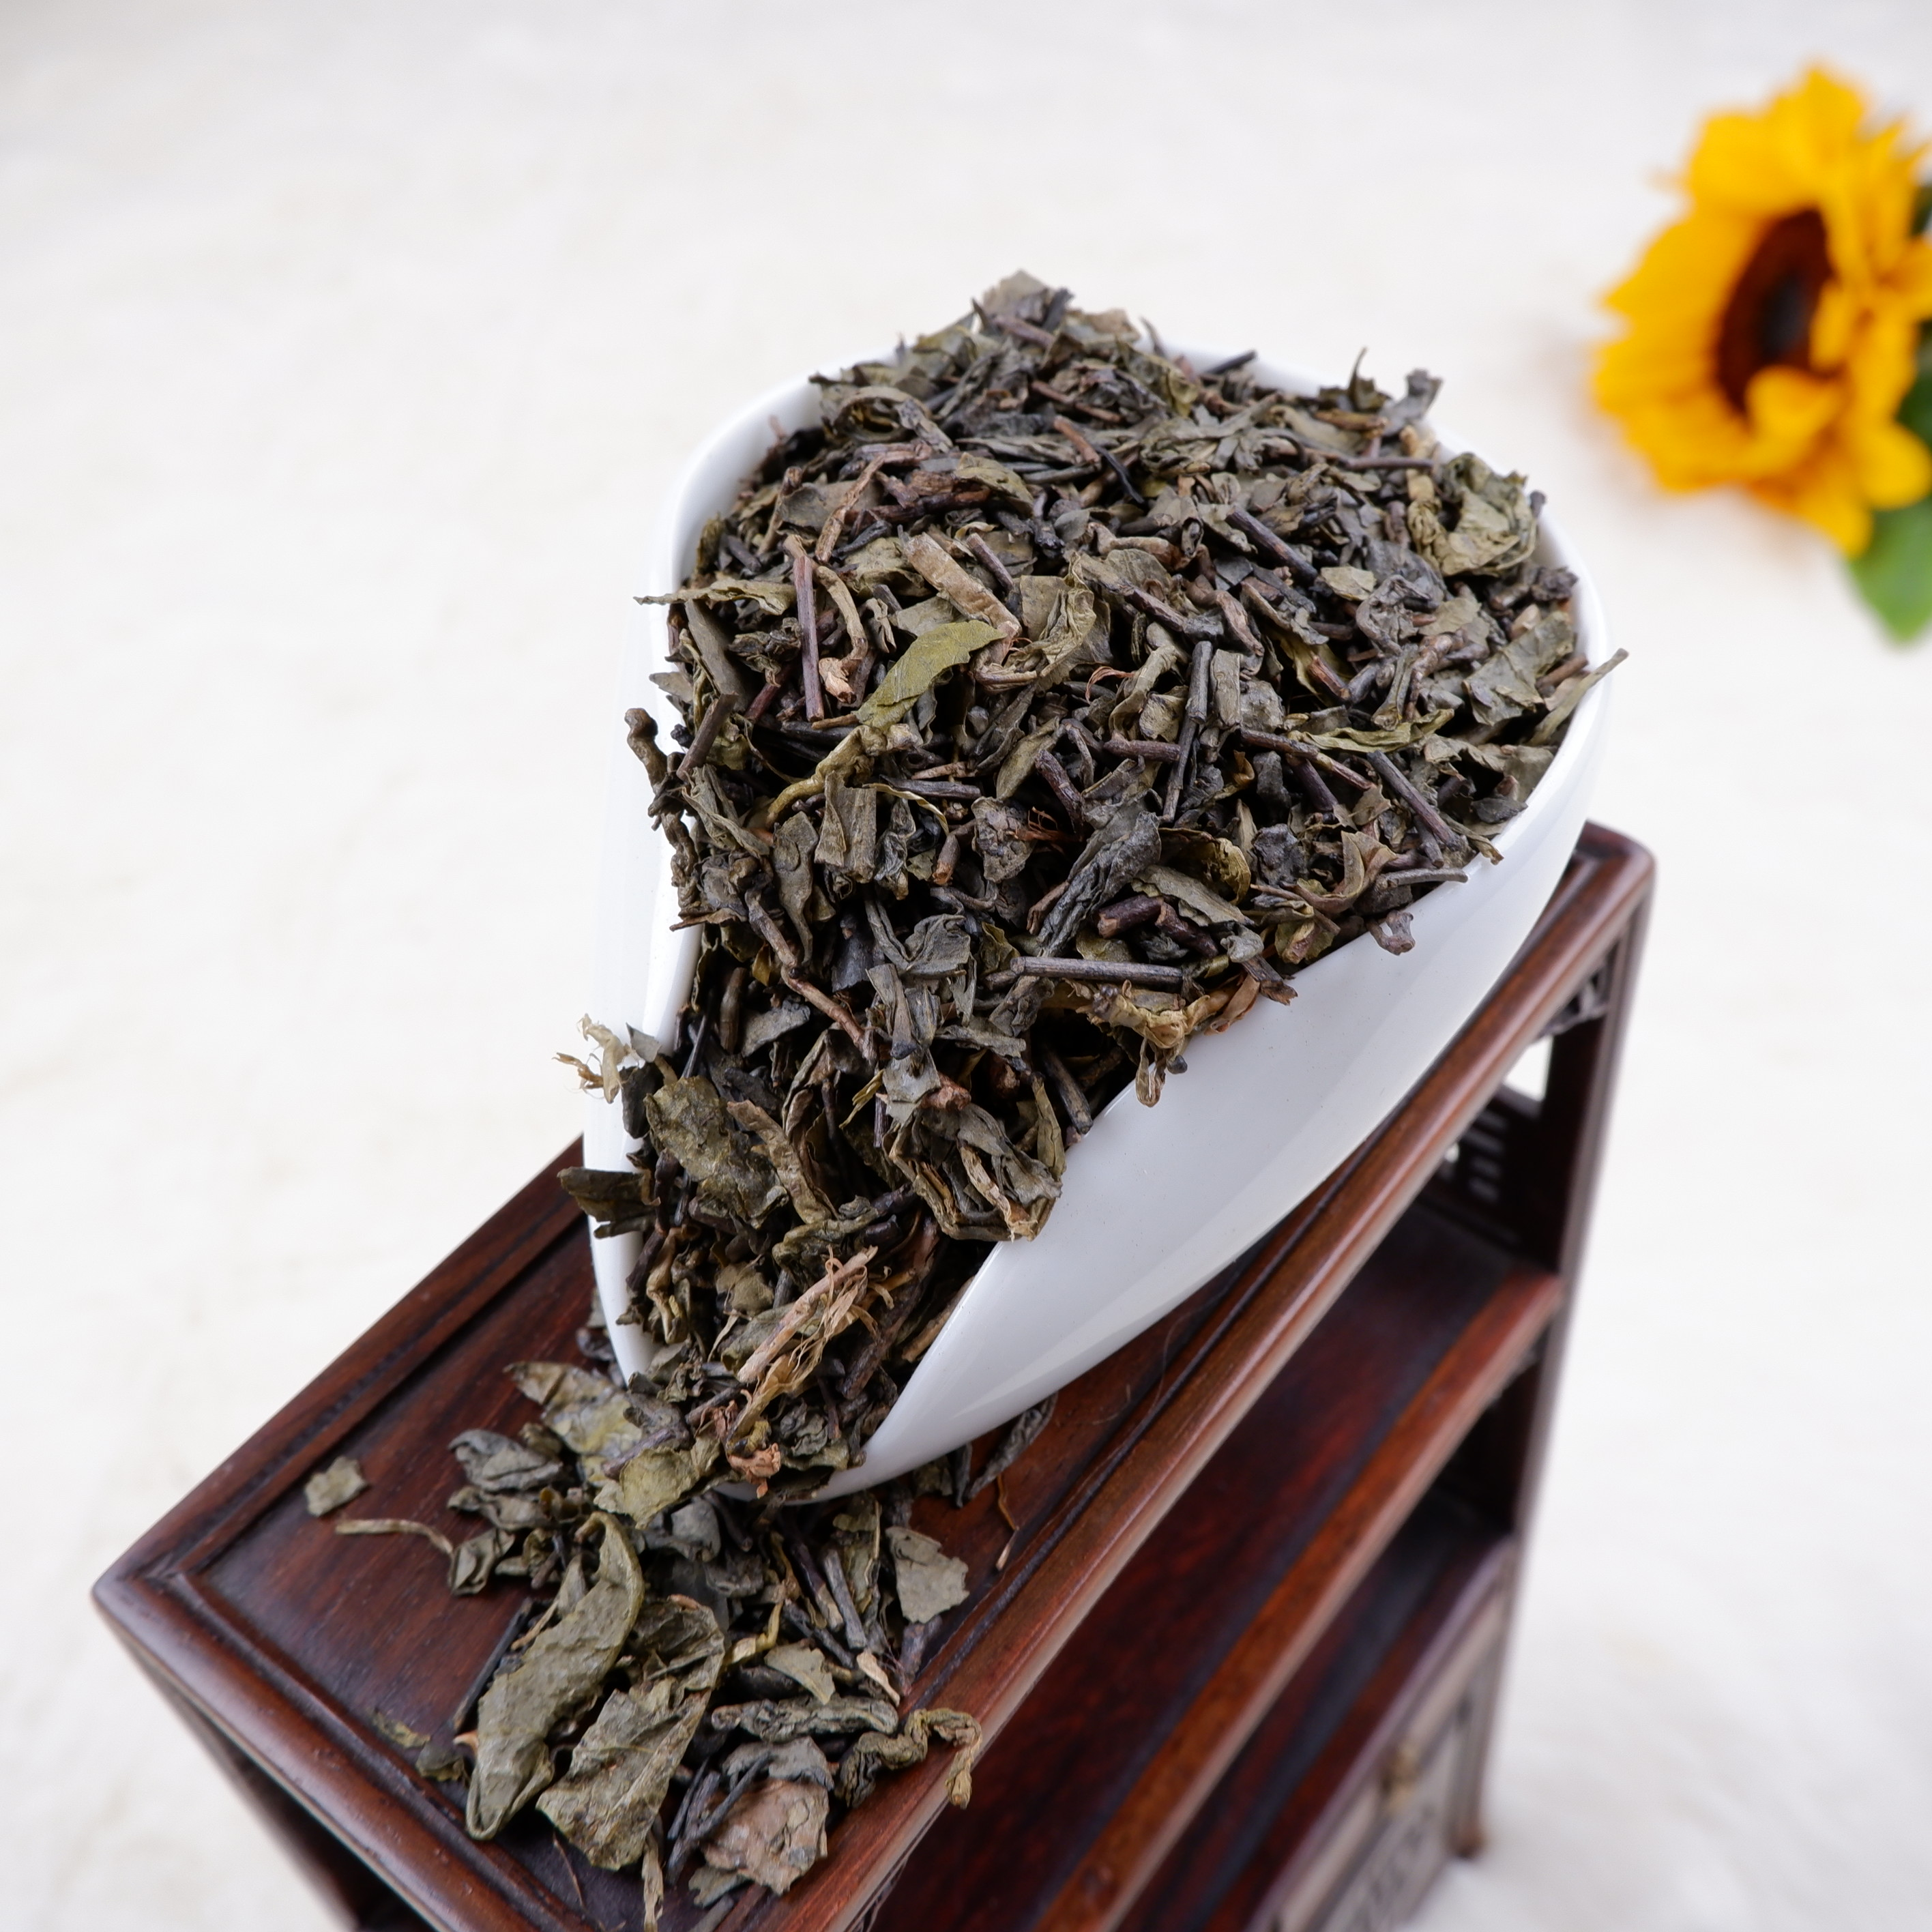 Good Quality Gunpowder Delicious And Natural Green Tea 9575 - 4uTea | 4uTea.com